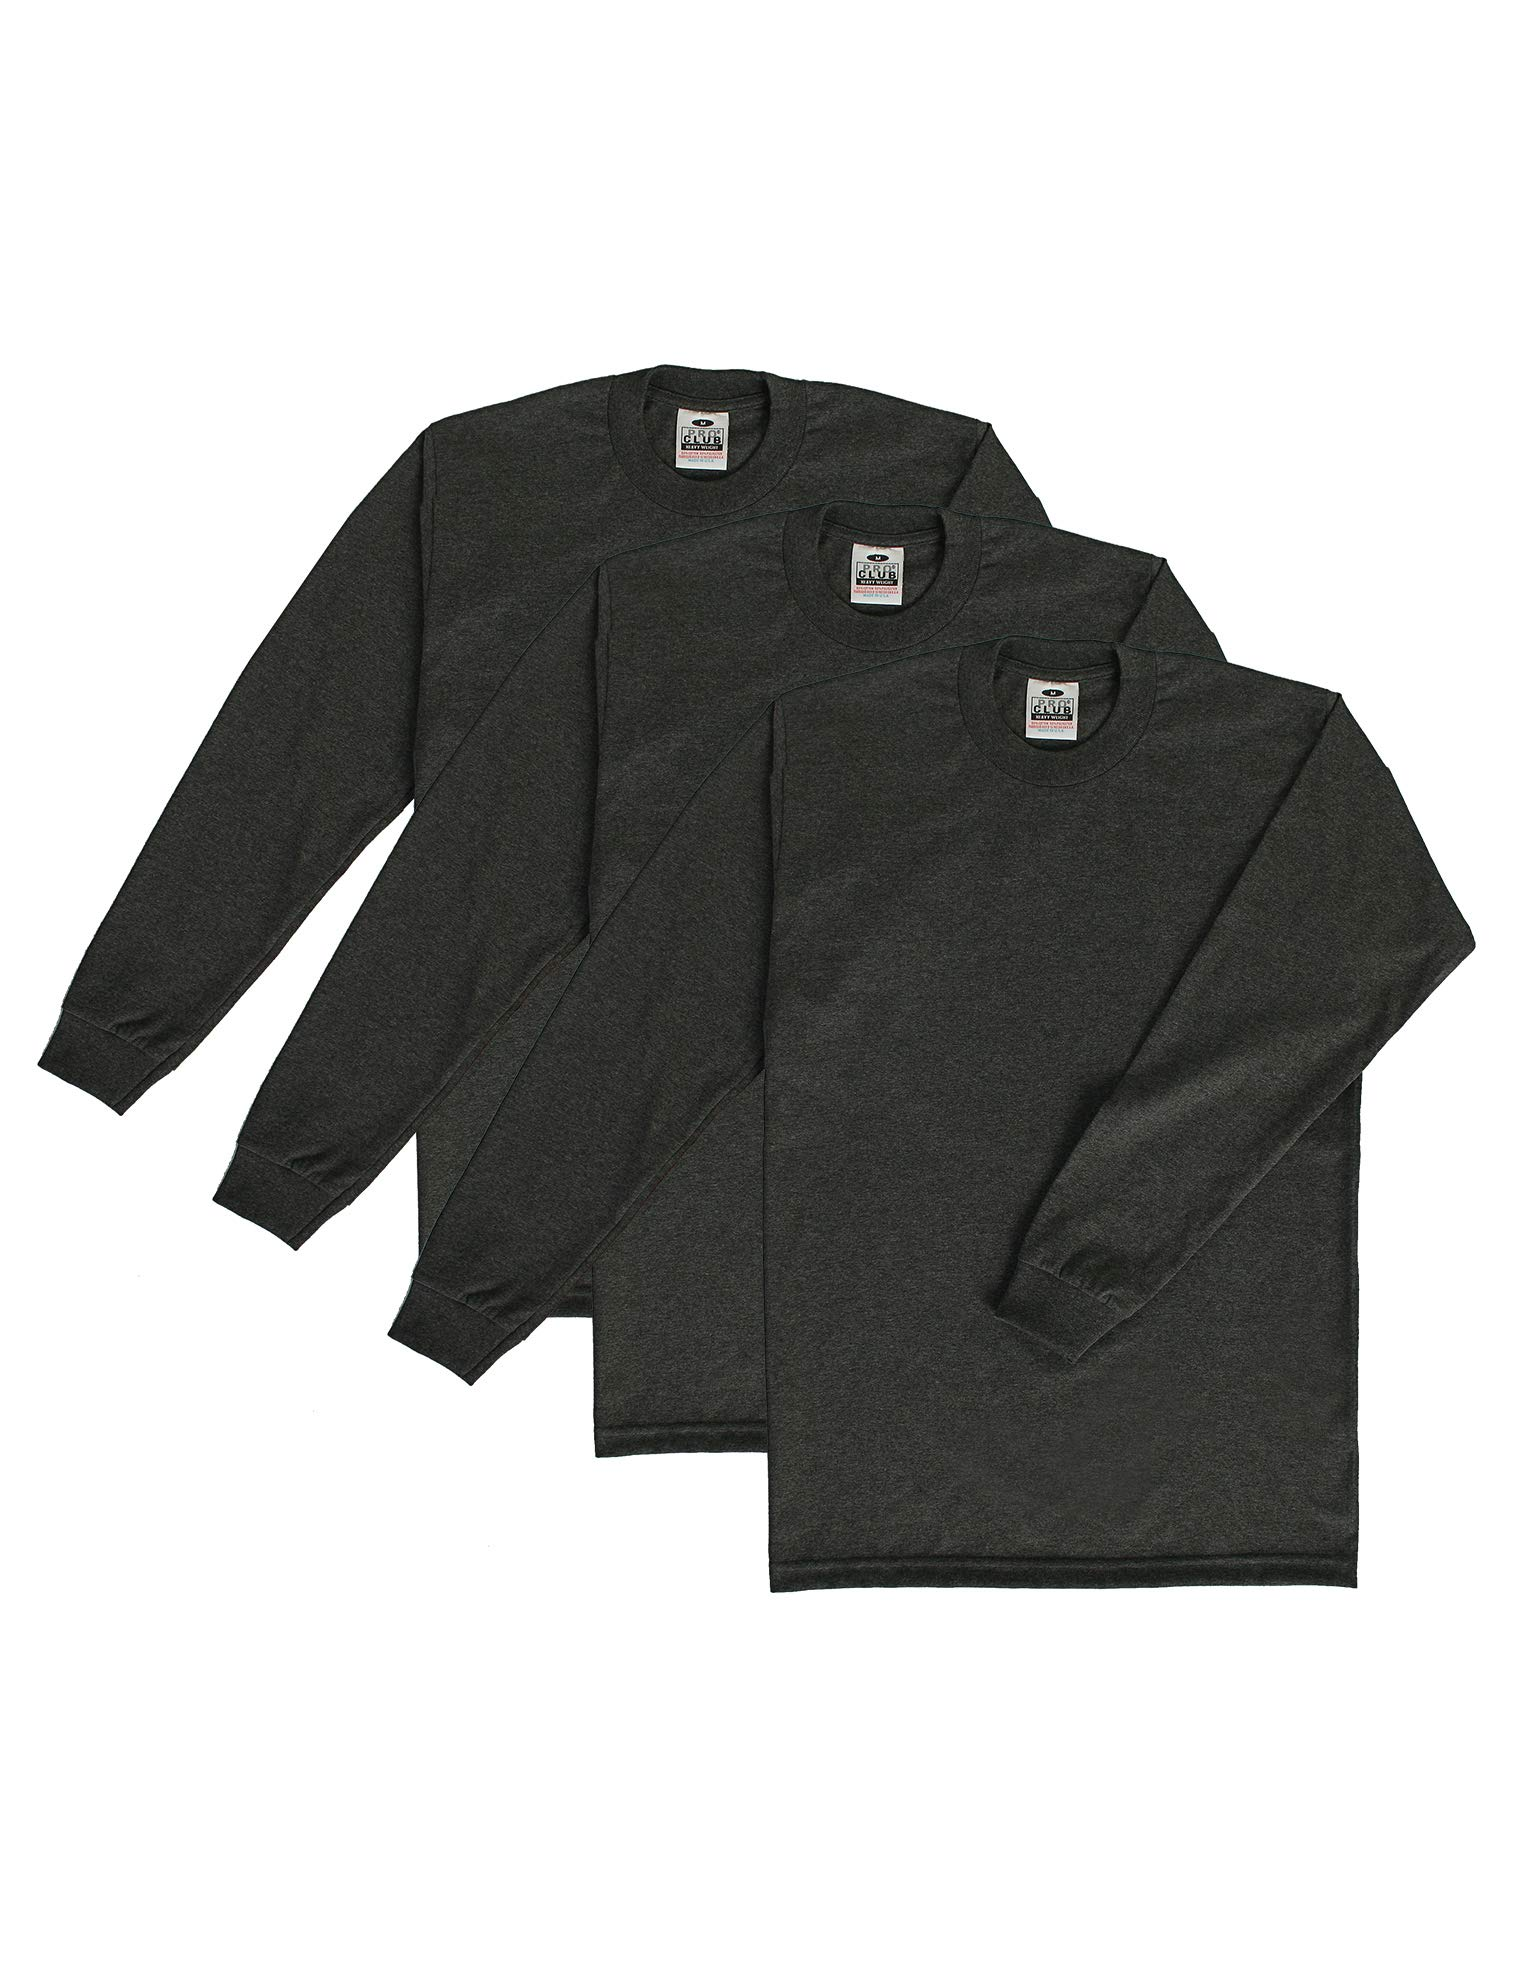 Pro Club Men's 3-Pack Heavyweight Cotton Long Sleeve Crew Neck T-Shirt, Charcoal, 5X-Tall